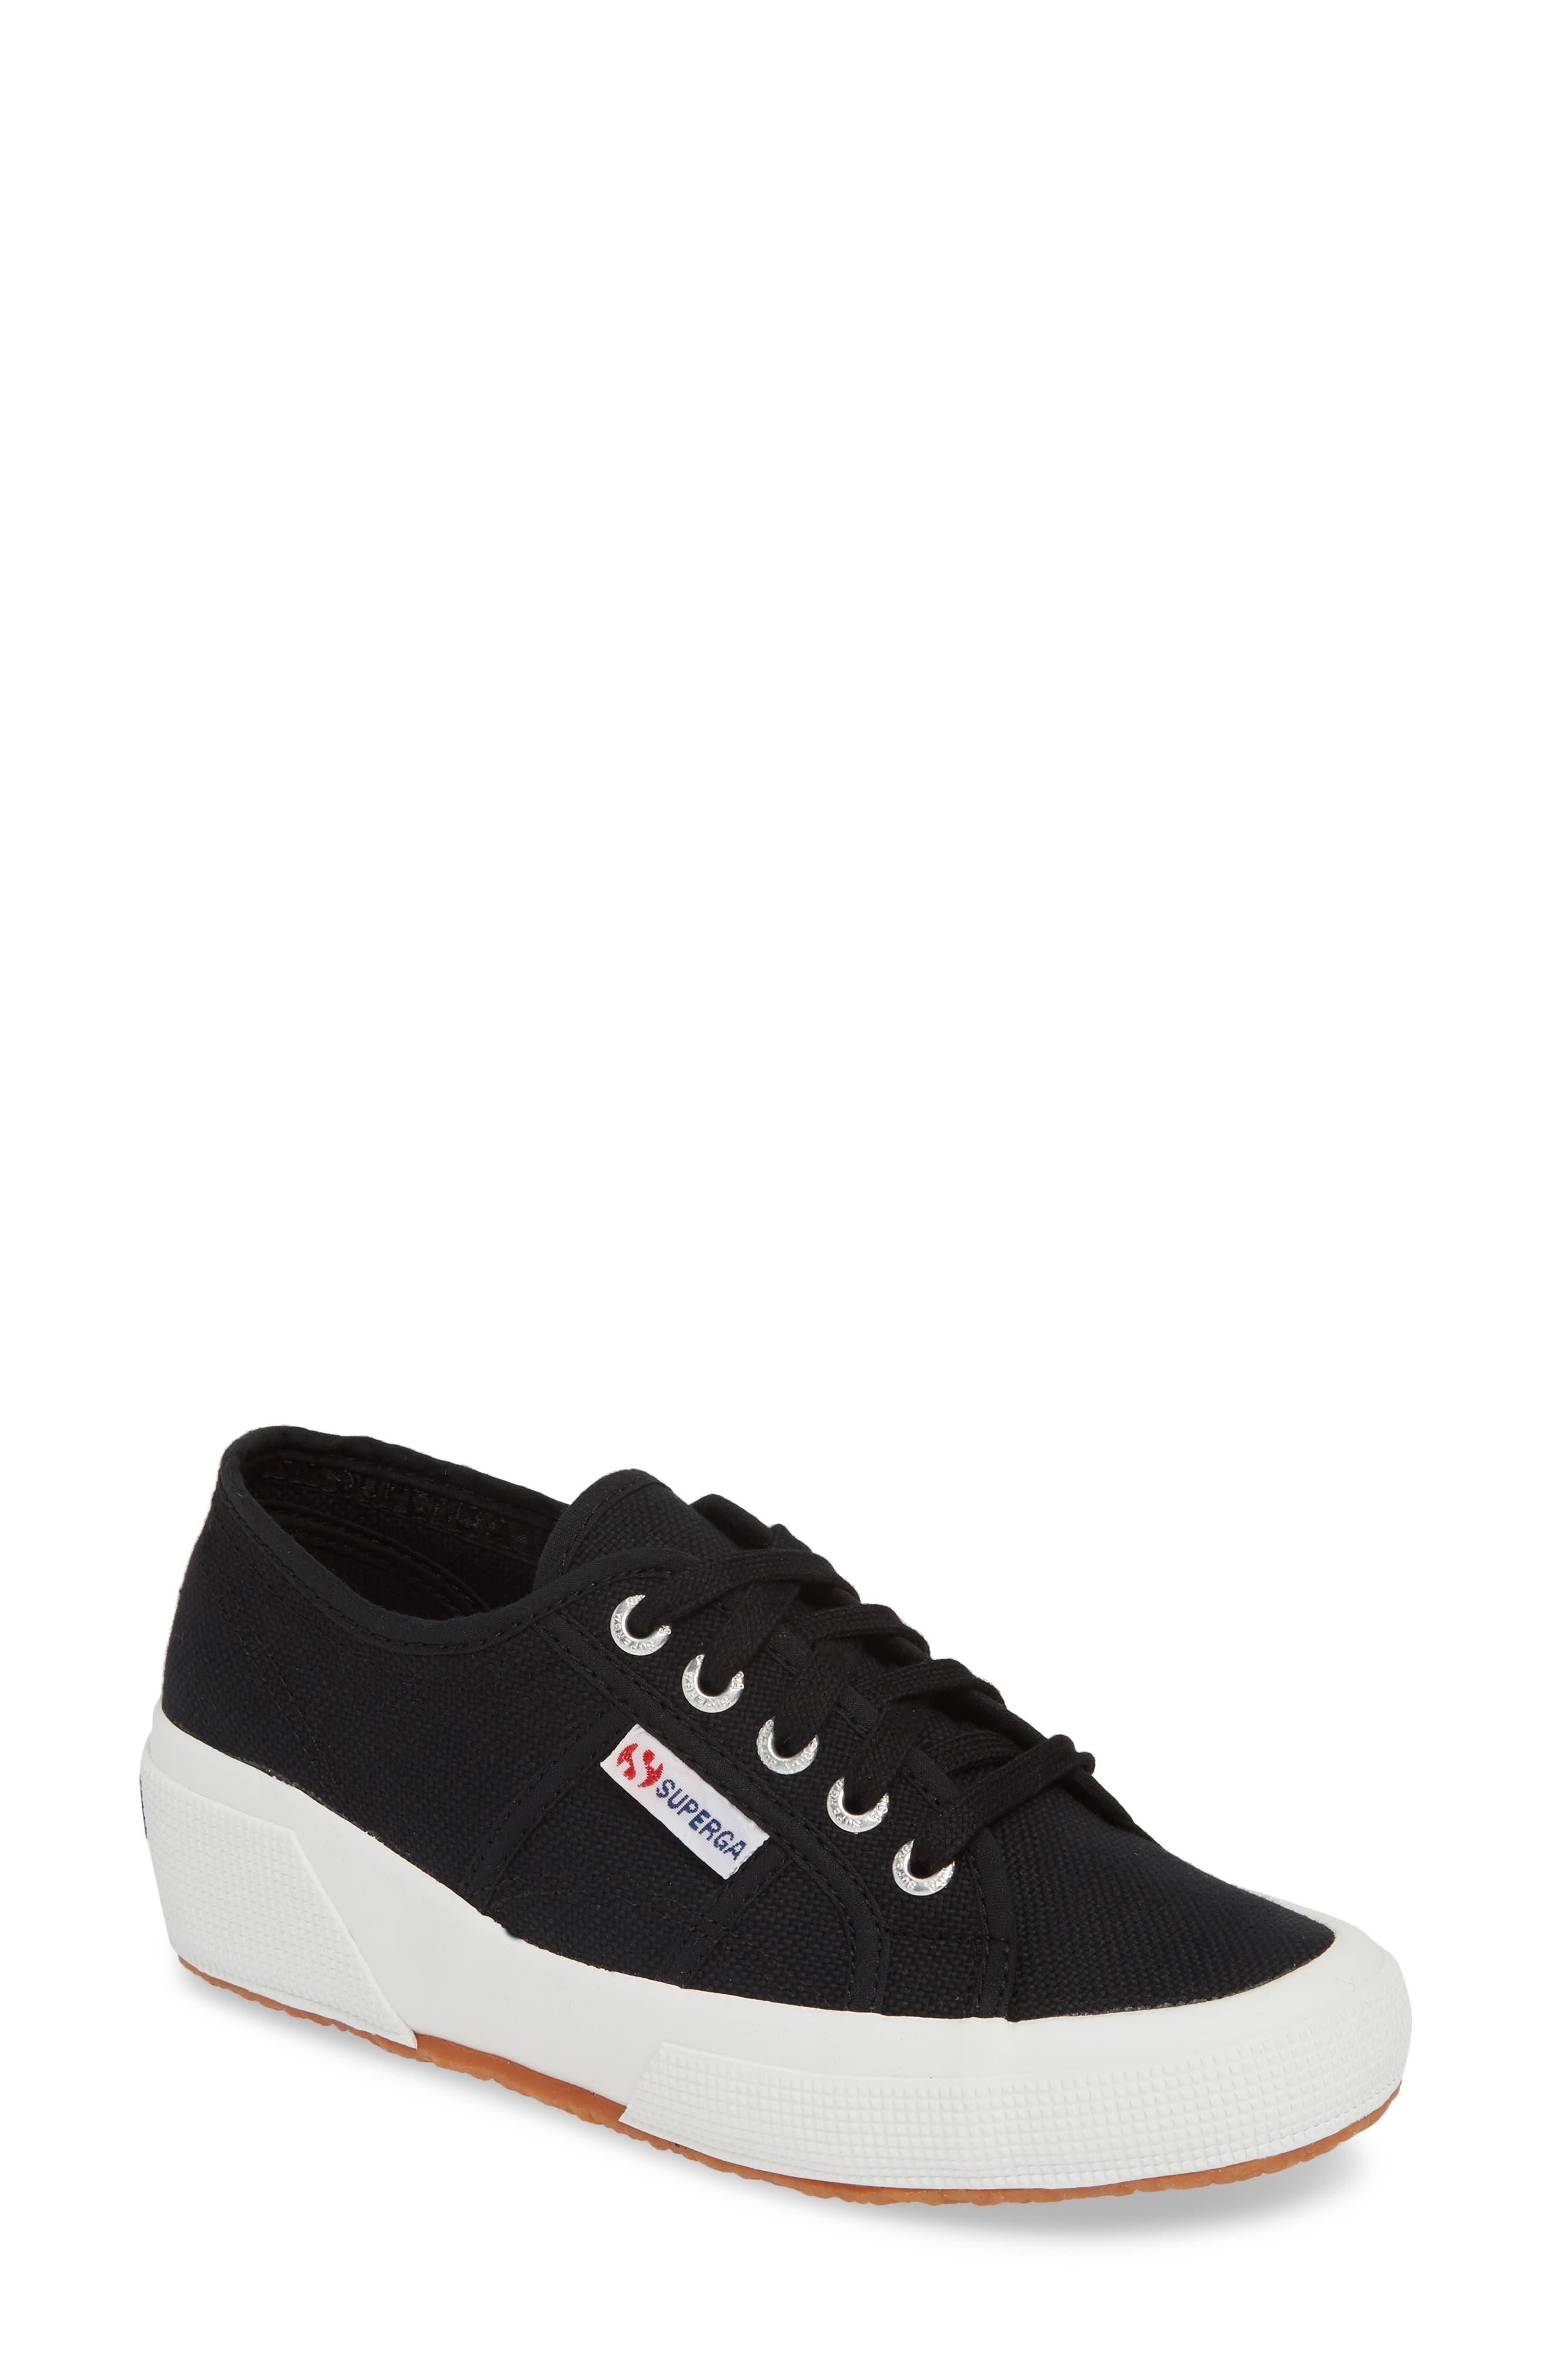 SUPERGA 'Linea' Wedge Sneaker, Main, color, BLACK / WHITE